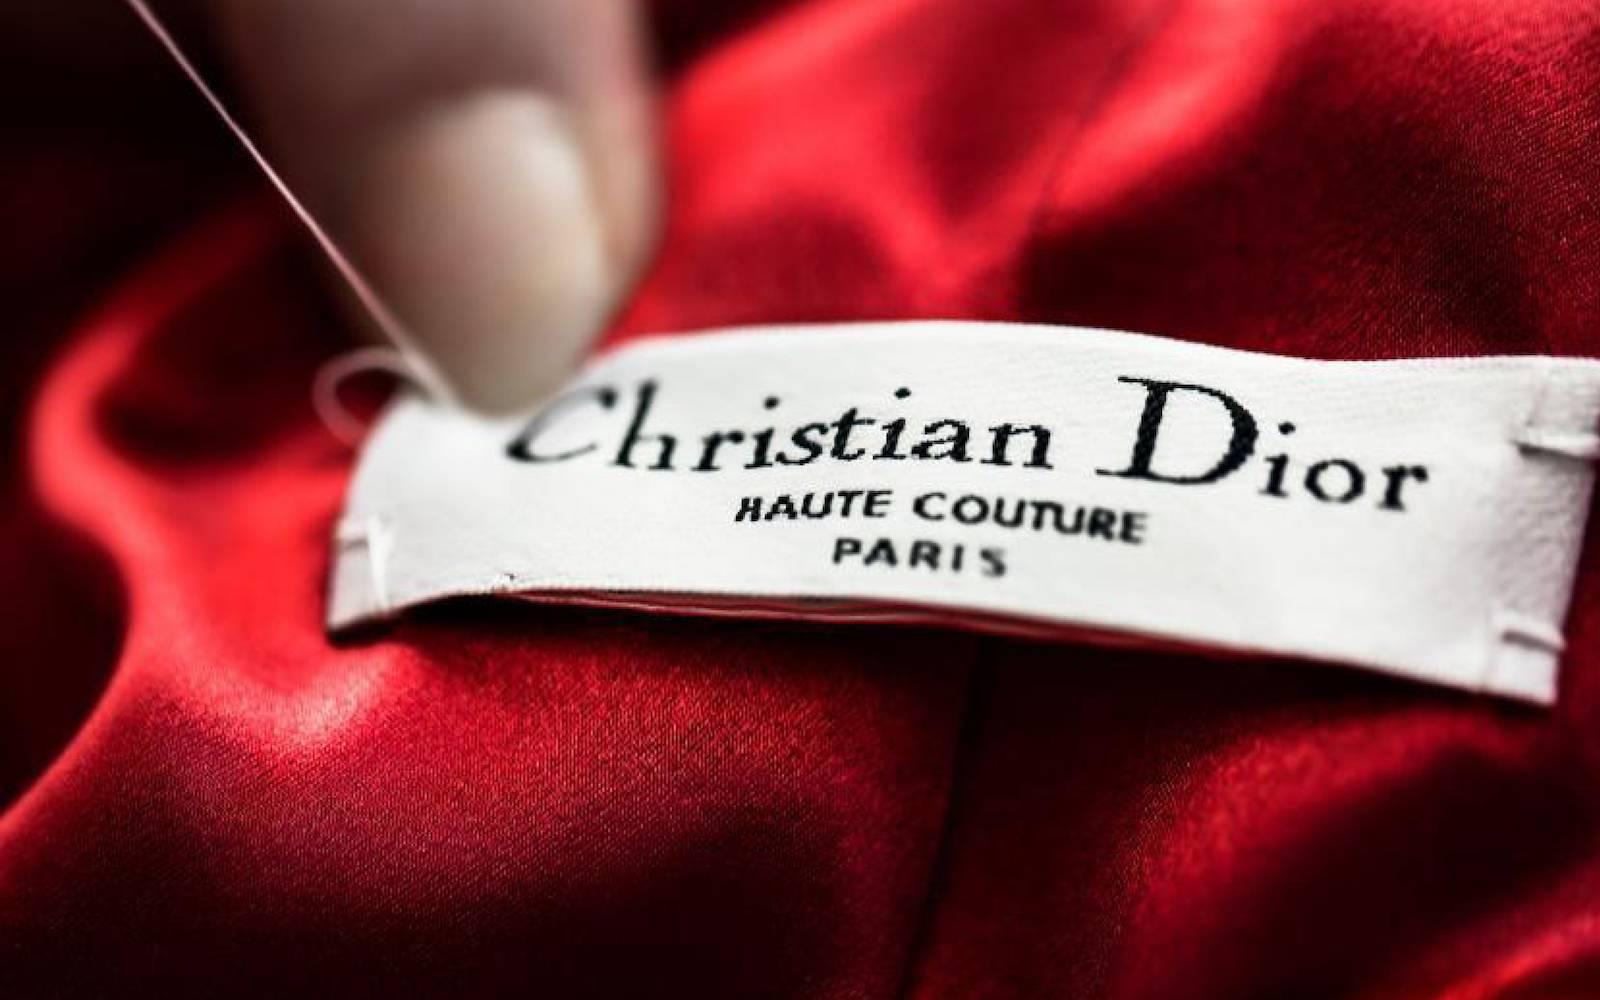 dior luxo moda lifestyle sugar baby mundo